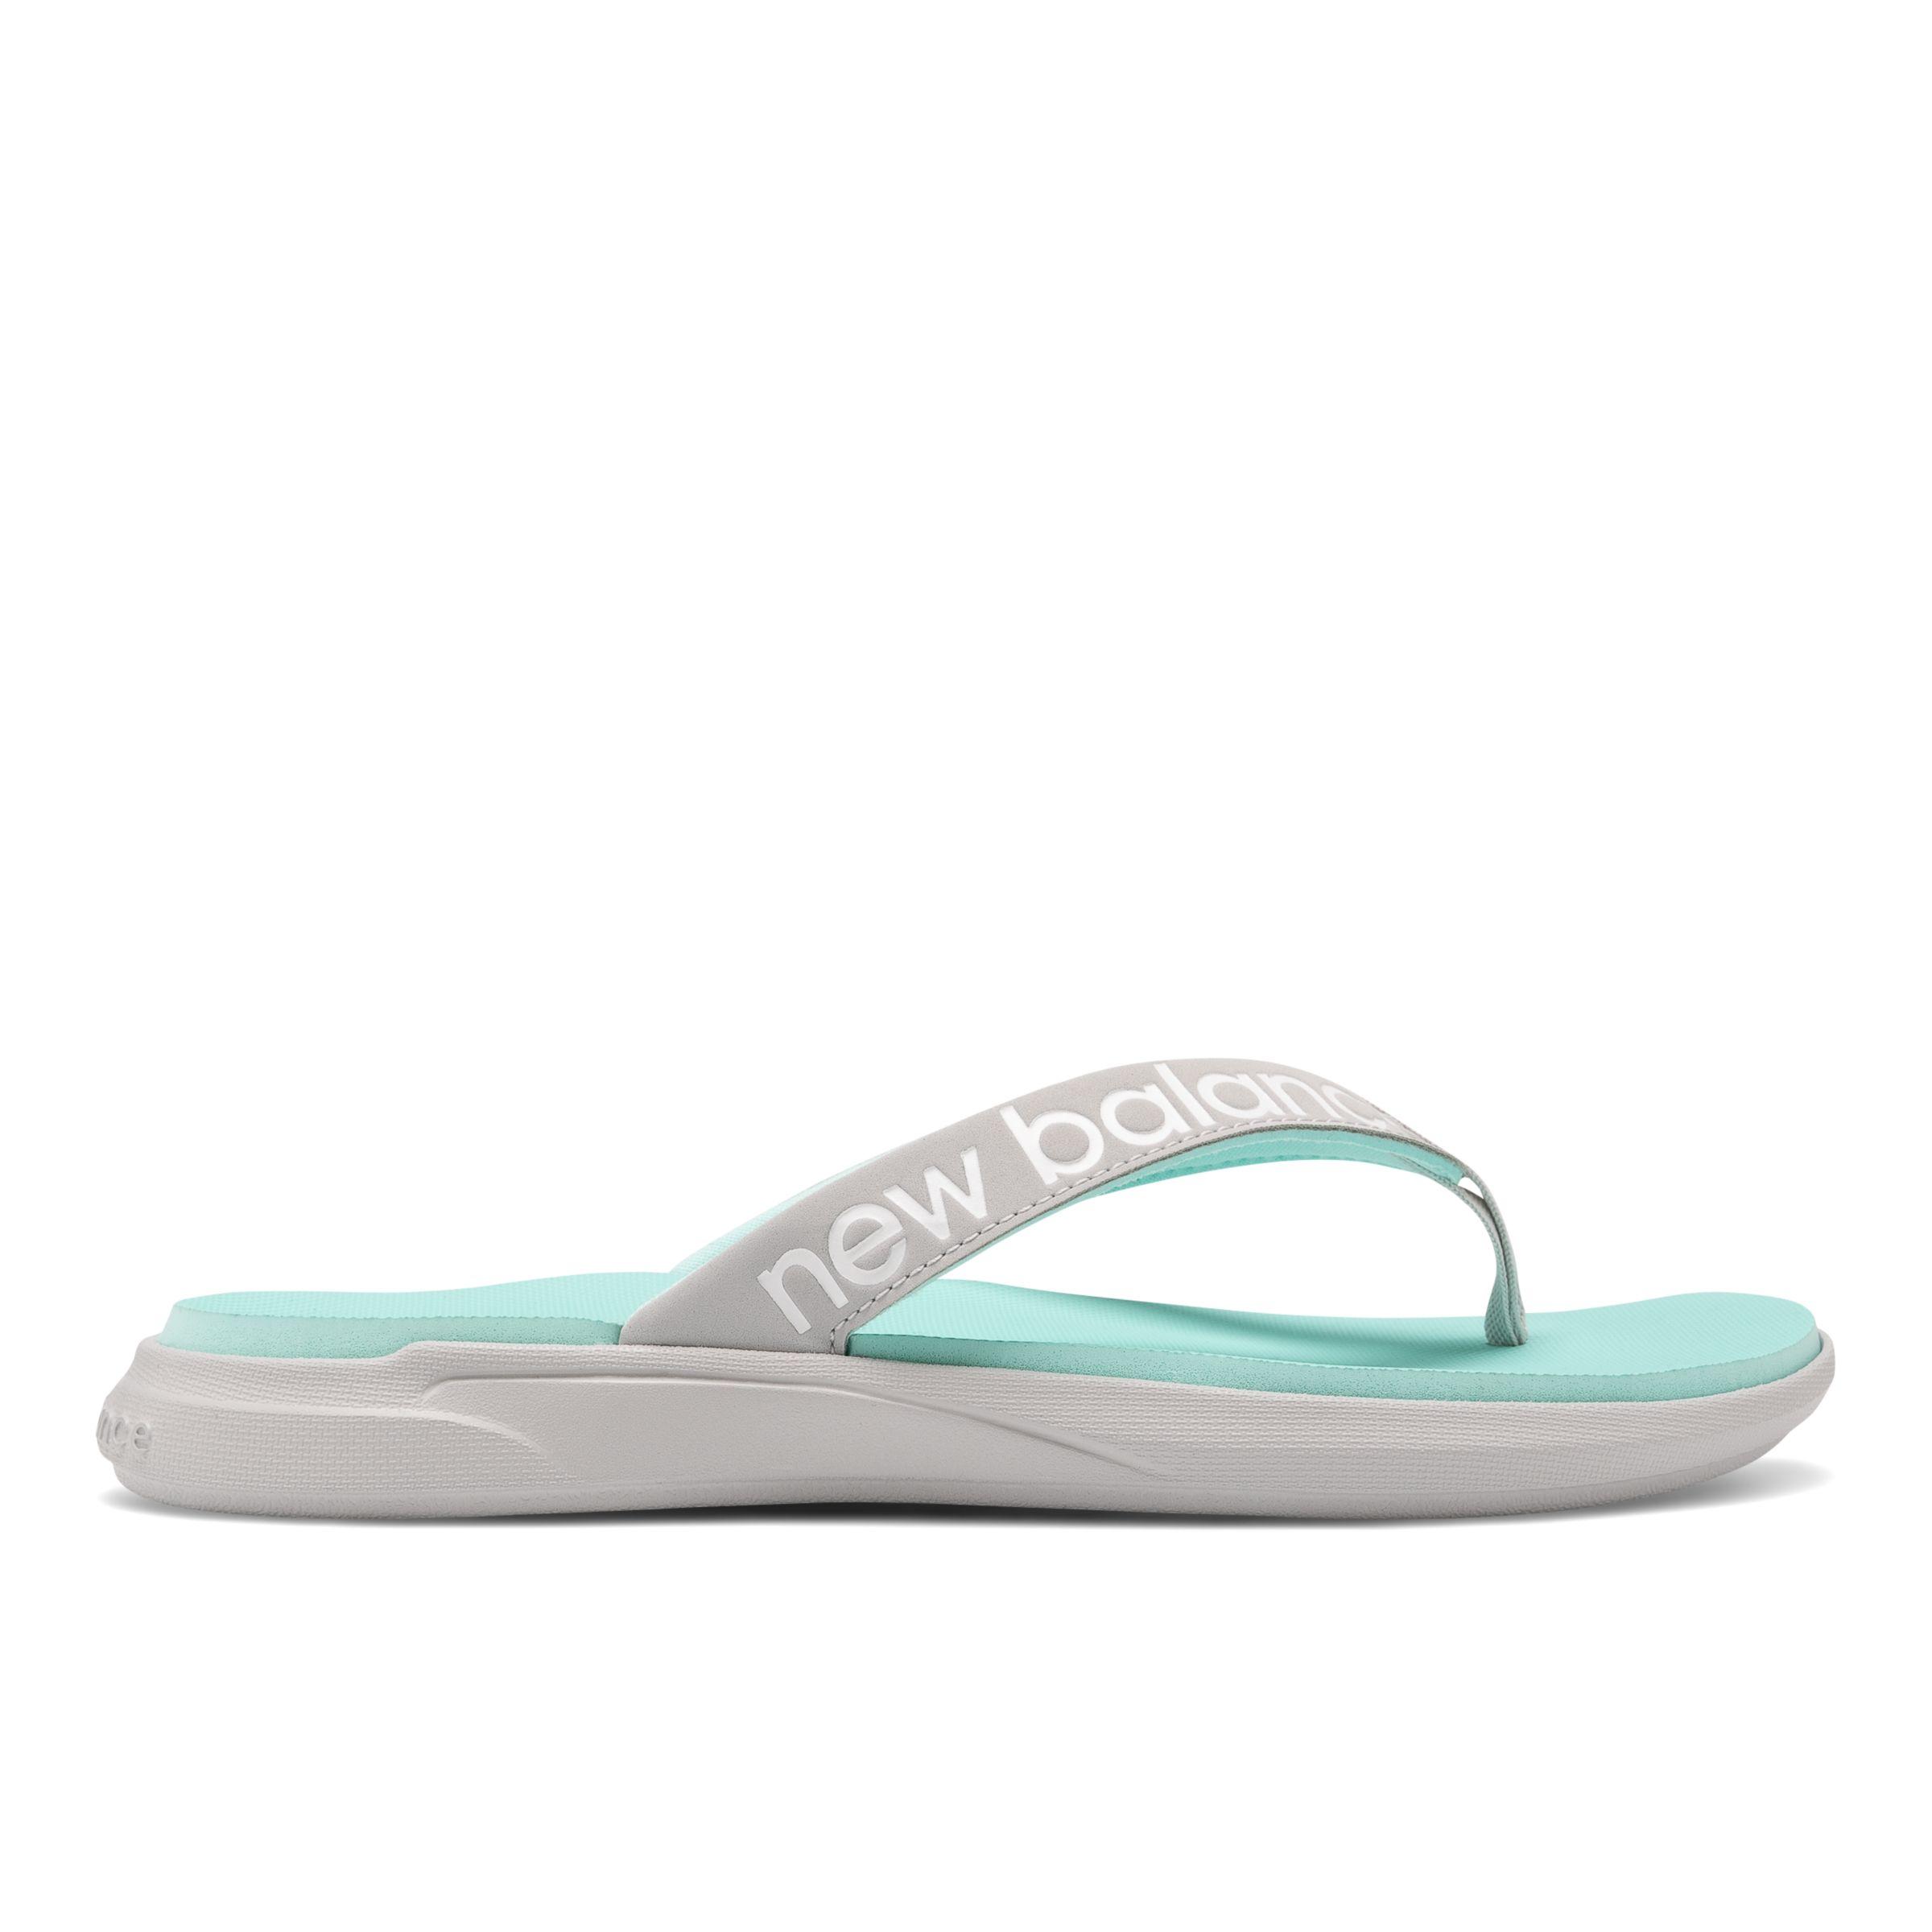 new balance flip flops w6032